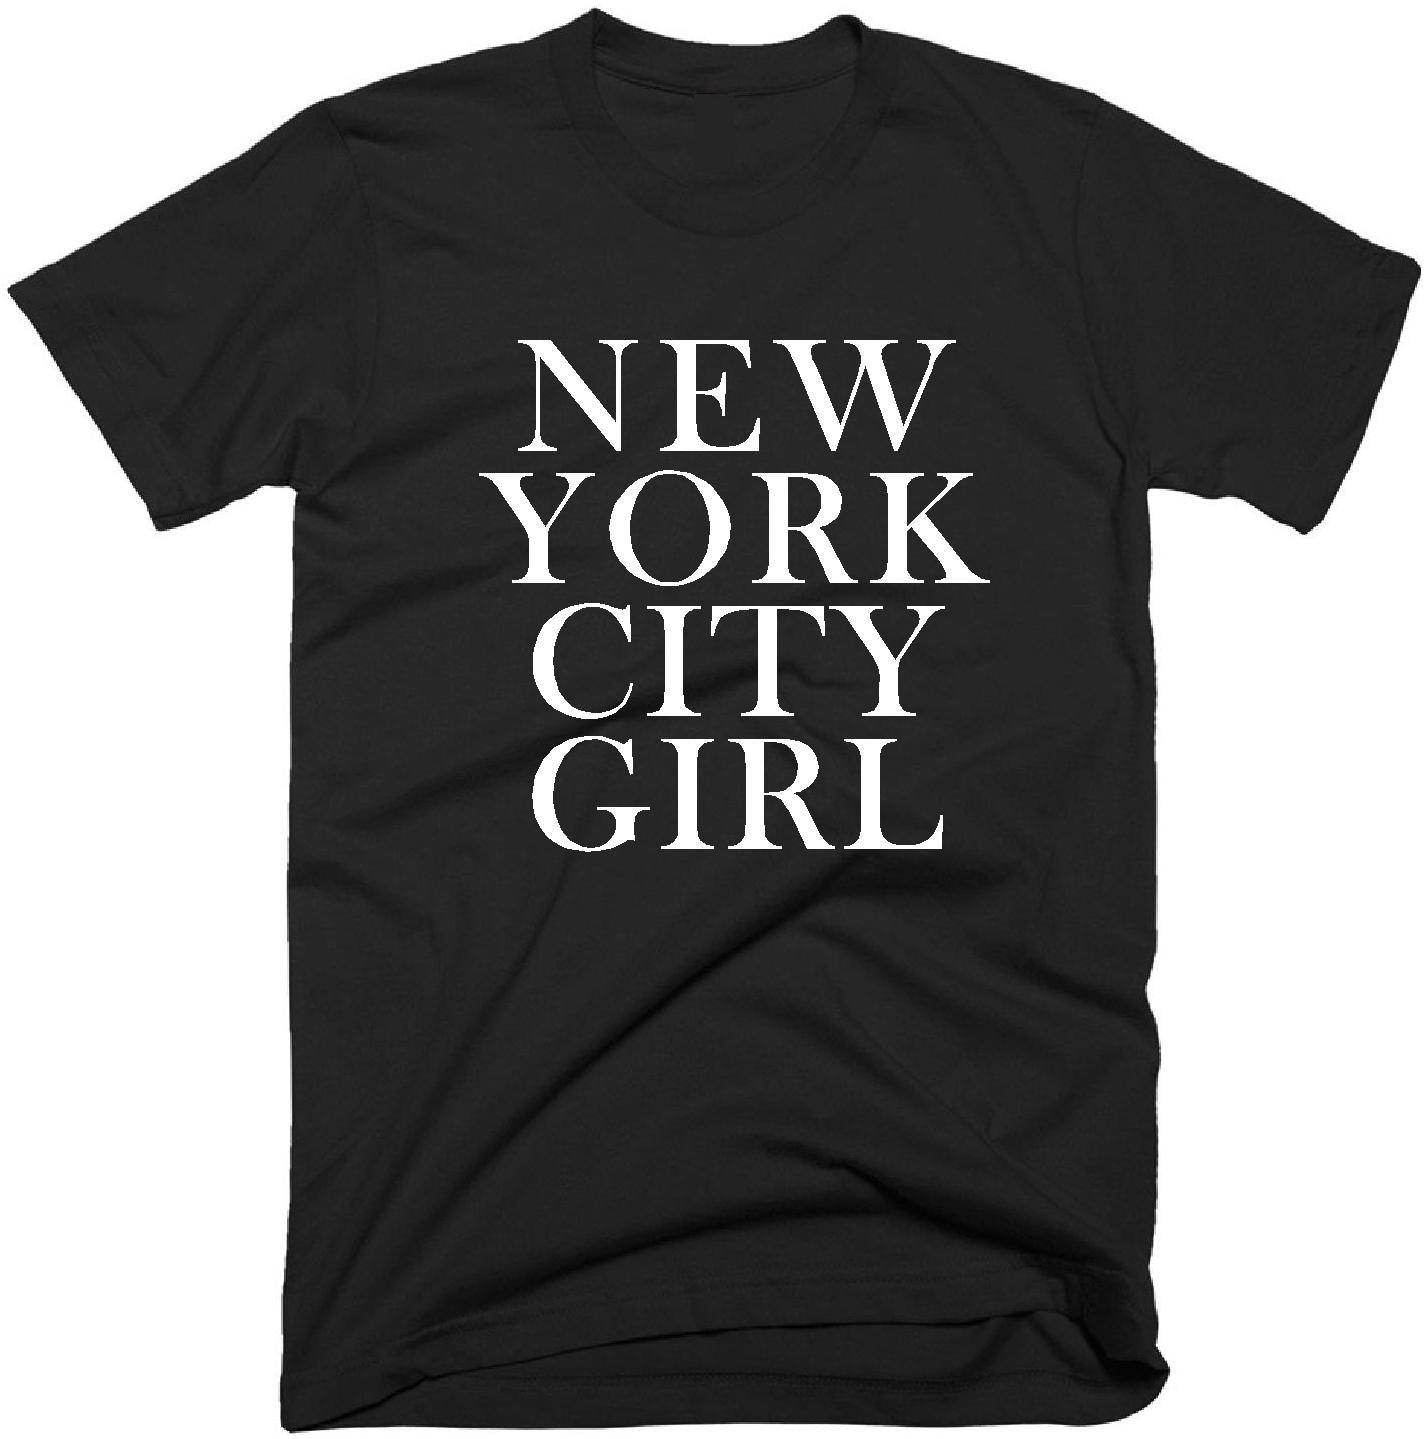 New York City Girl T Shirt Women s Girls Ladies T-Shirt  d39efc552c2